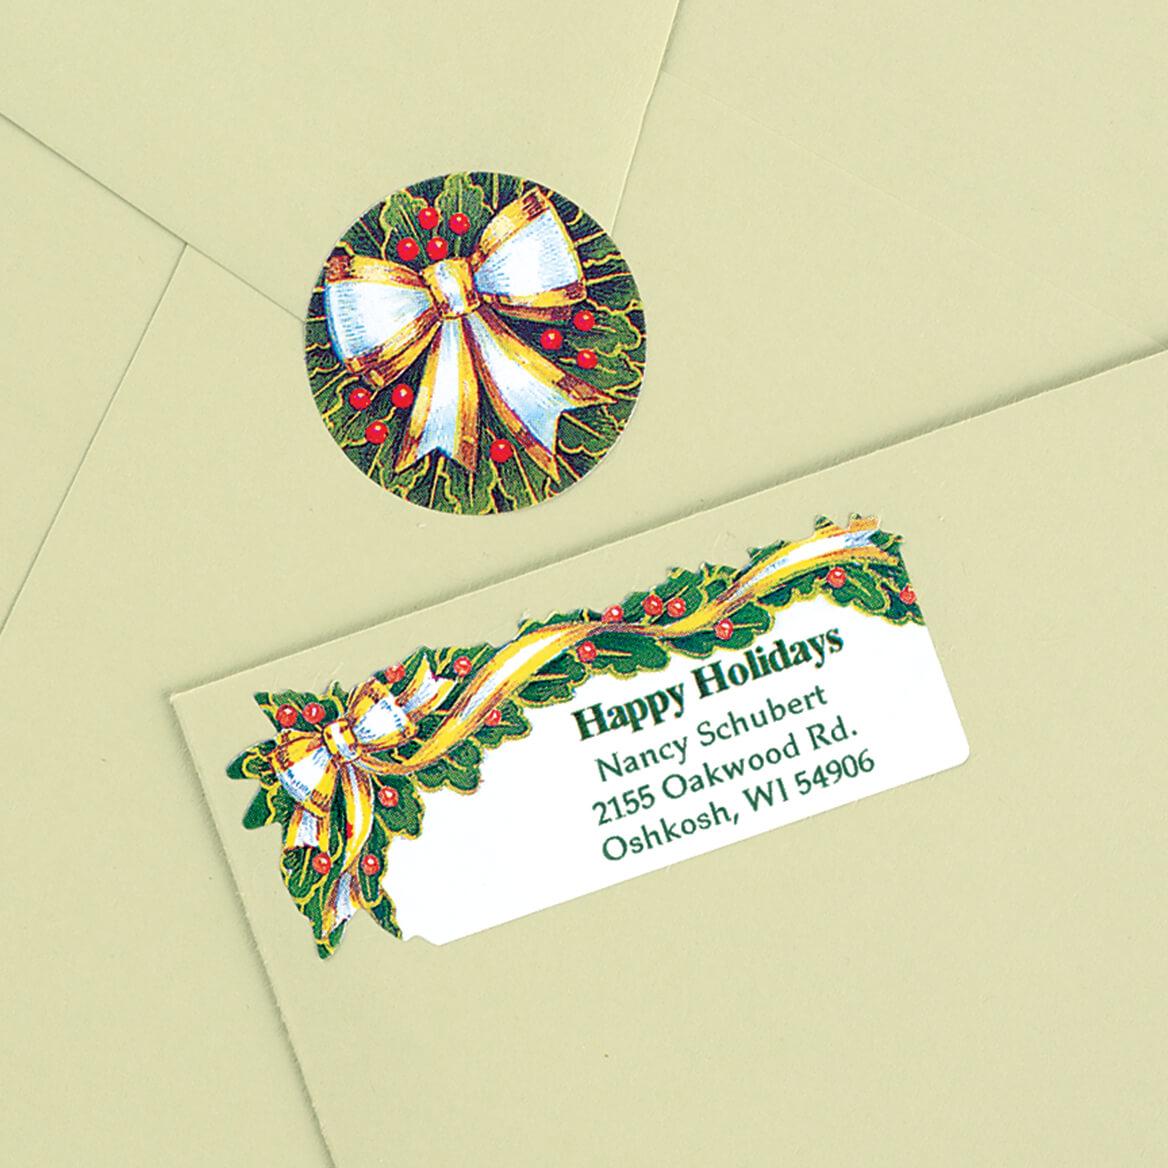 Holly and Ribbon Labels and Seals-311853